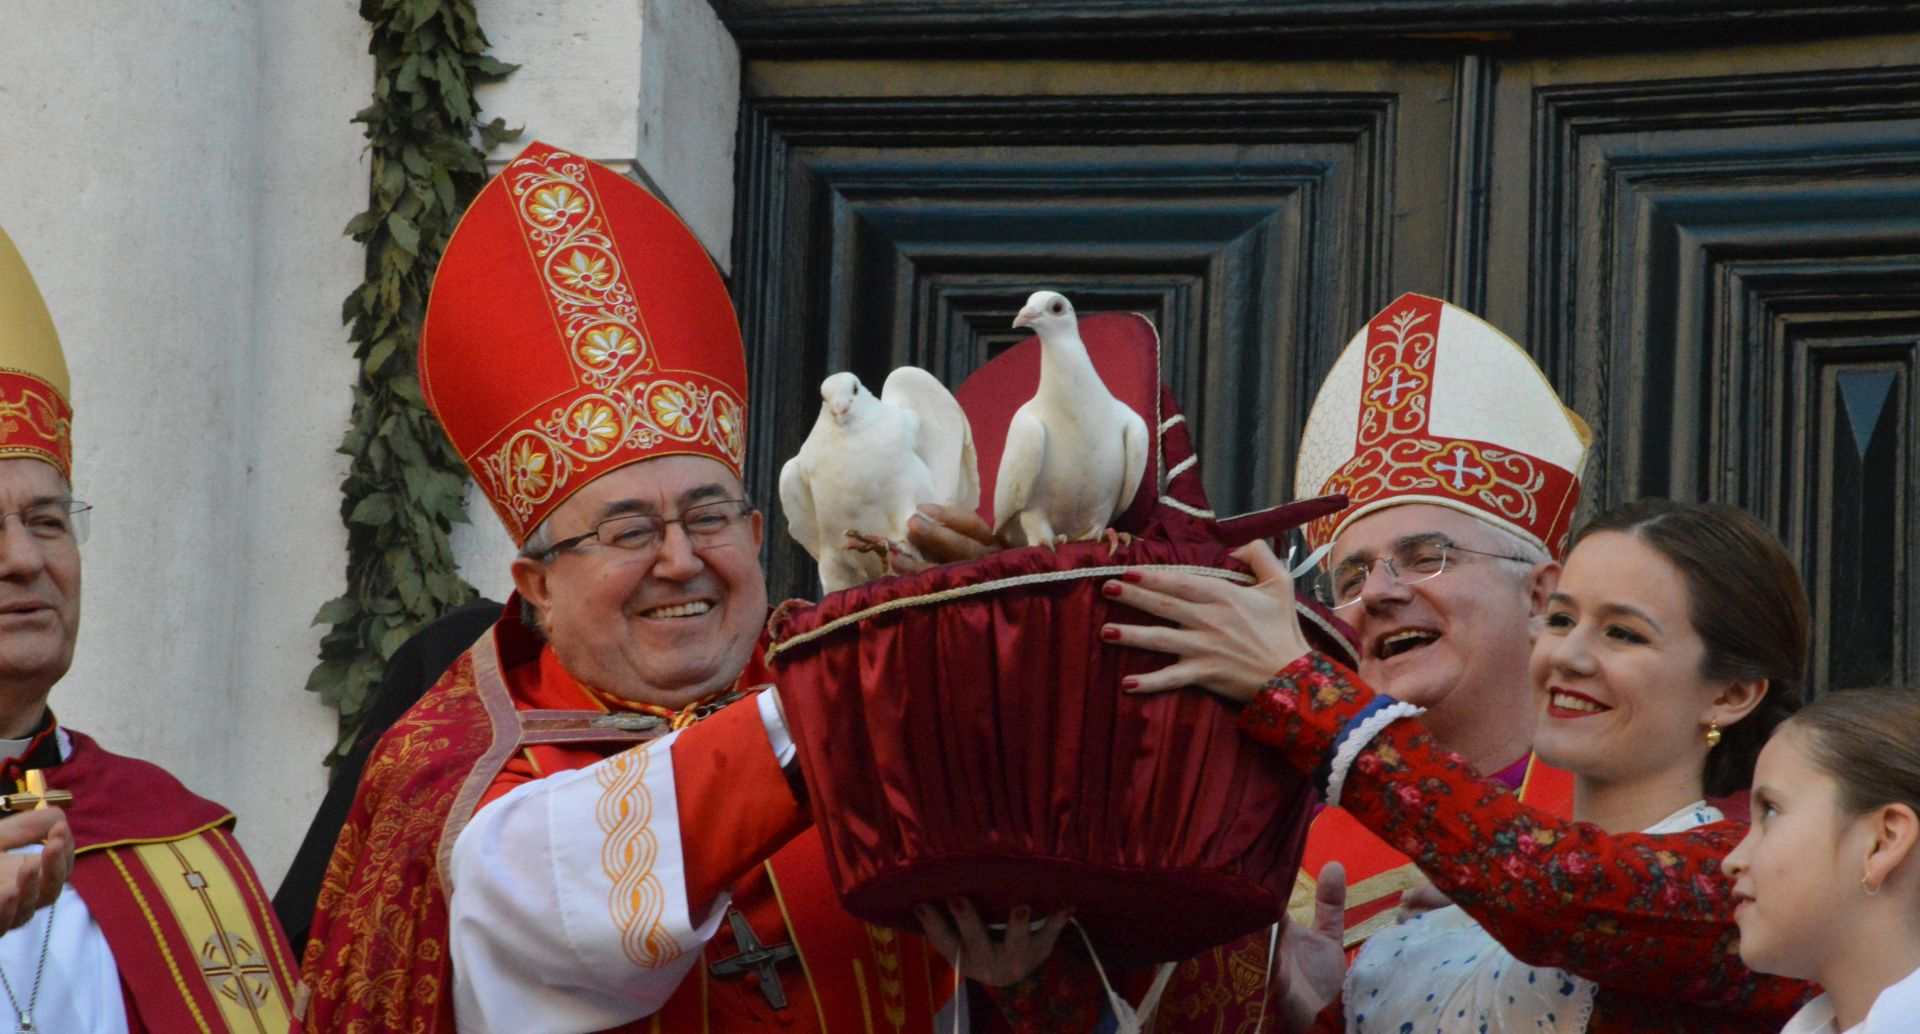 DUBROVNIK: Otvorena 1044. festa sv. Vlaha